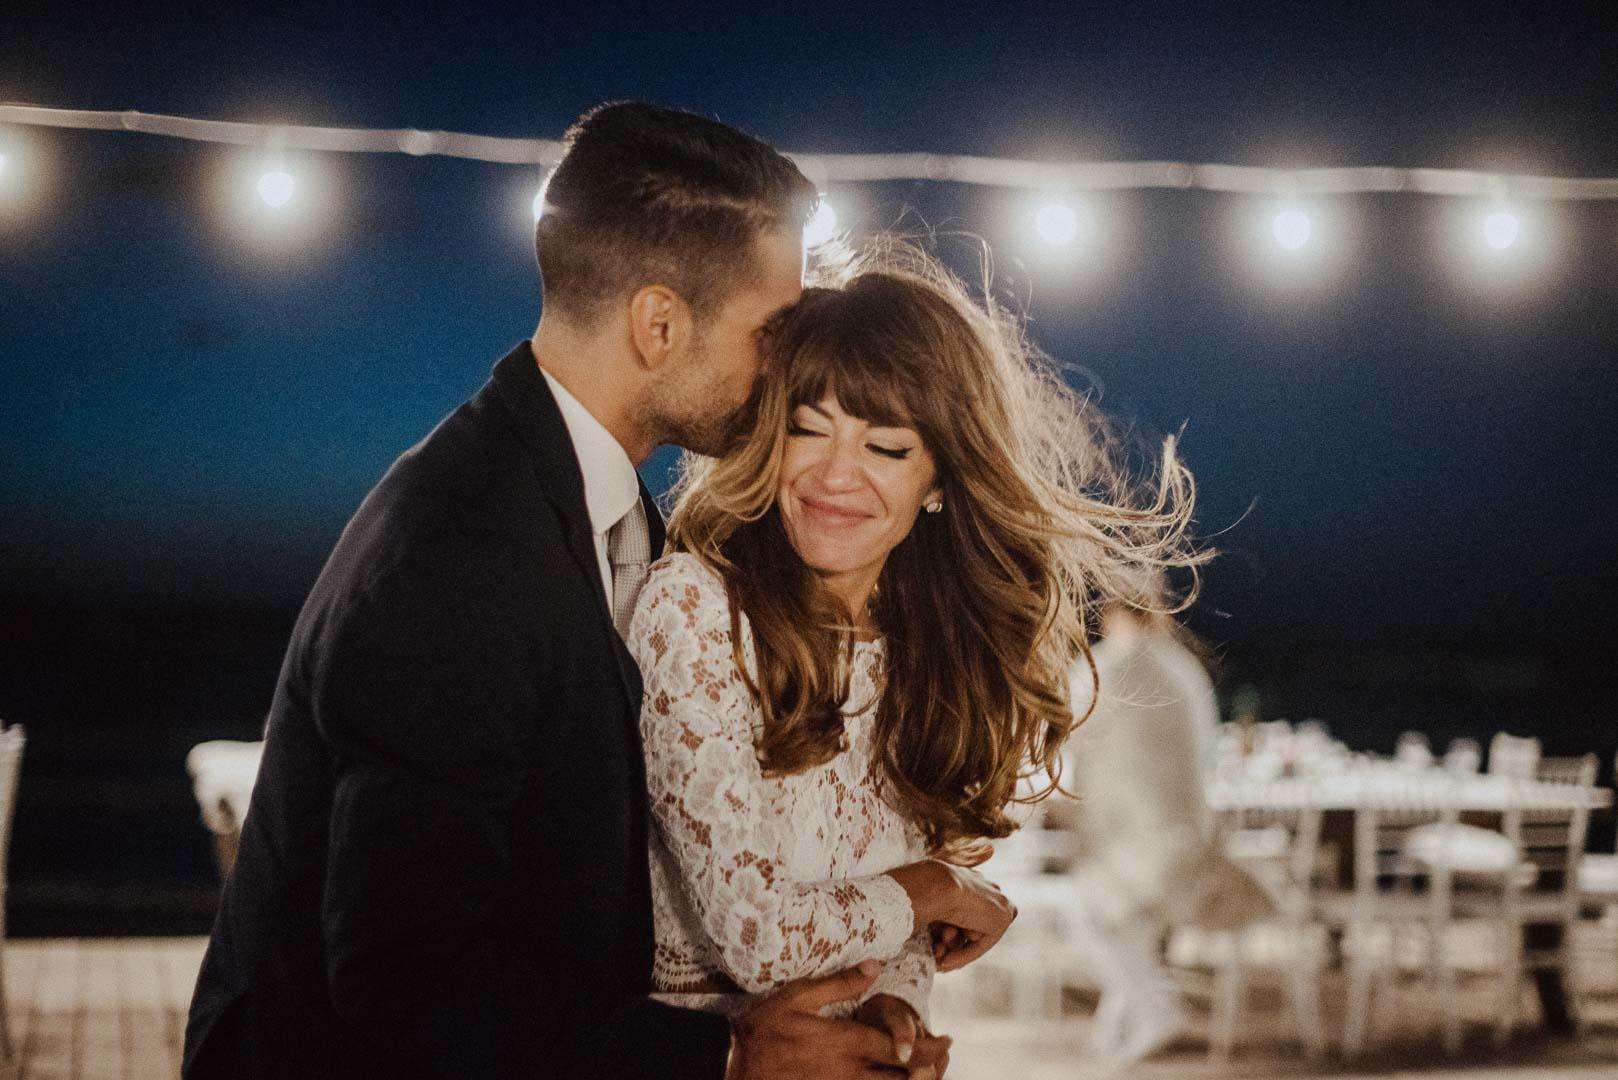 wedding-photographer-destination-fineart-bespoke-reportage-napoli-nabilah-vivianeizzo-spazio46-163